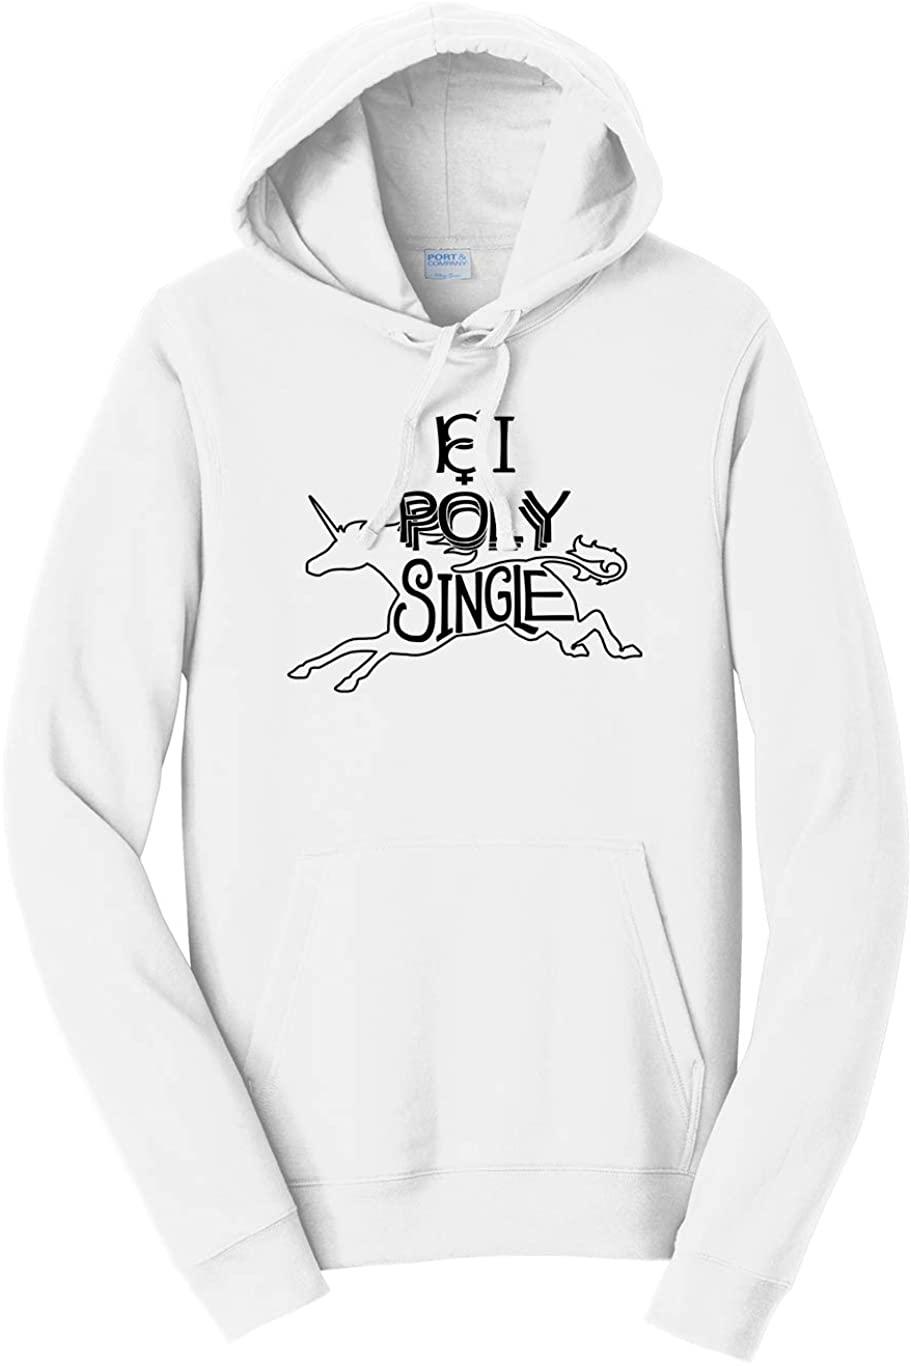 Tenacitee Unisex Bi & Poly & Single Hooded Sweatshirt